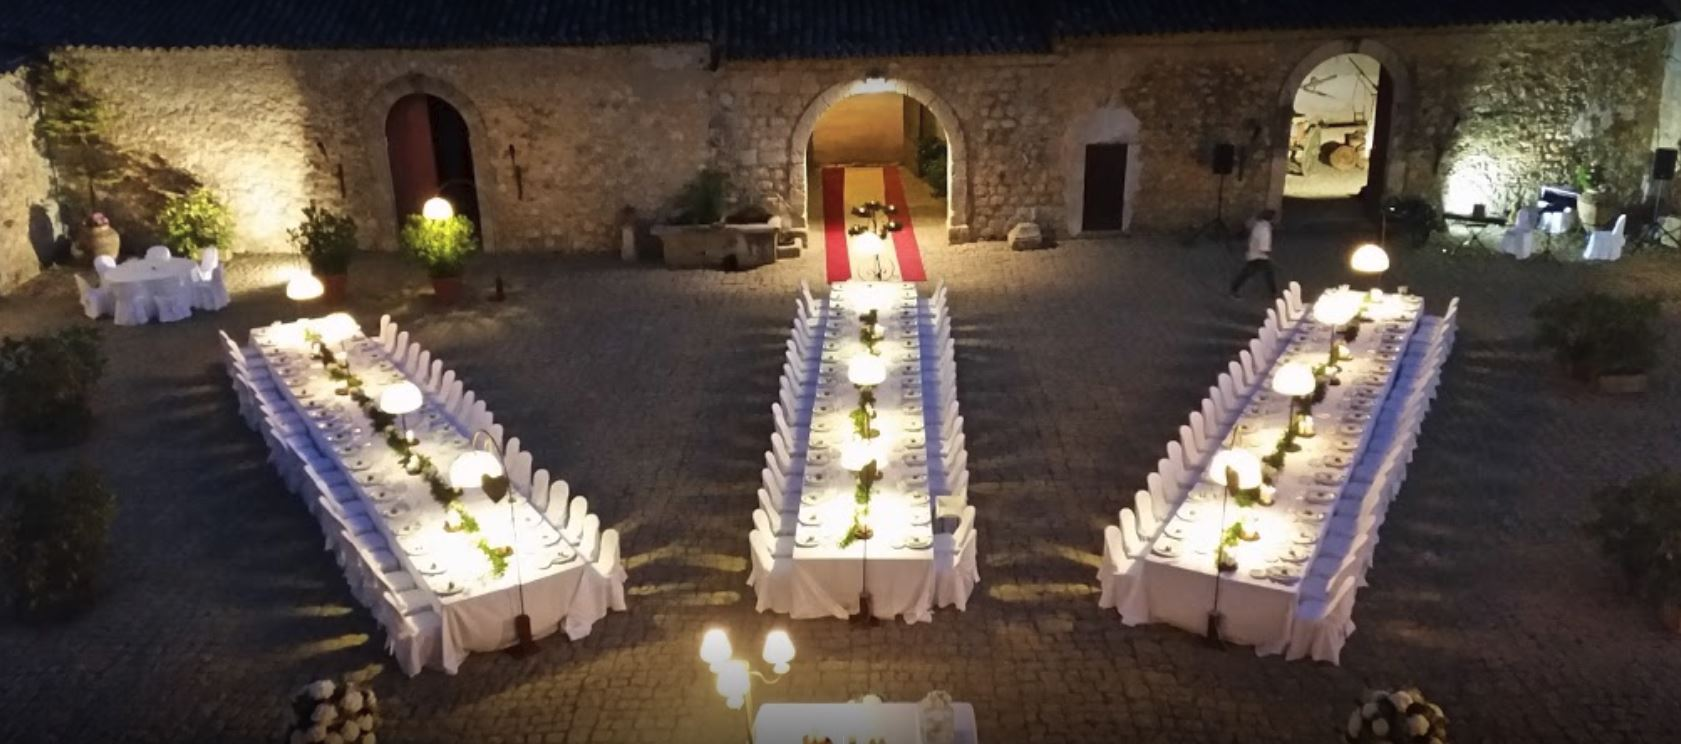 Masseria Mandrascate: location top per matrimoni